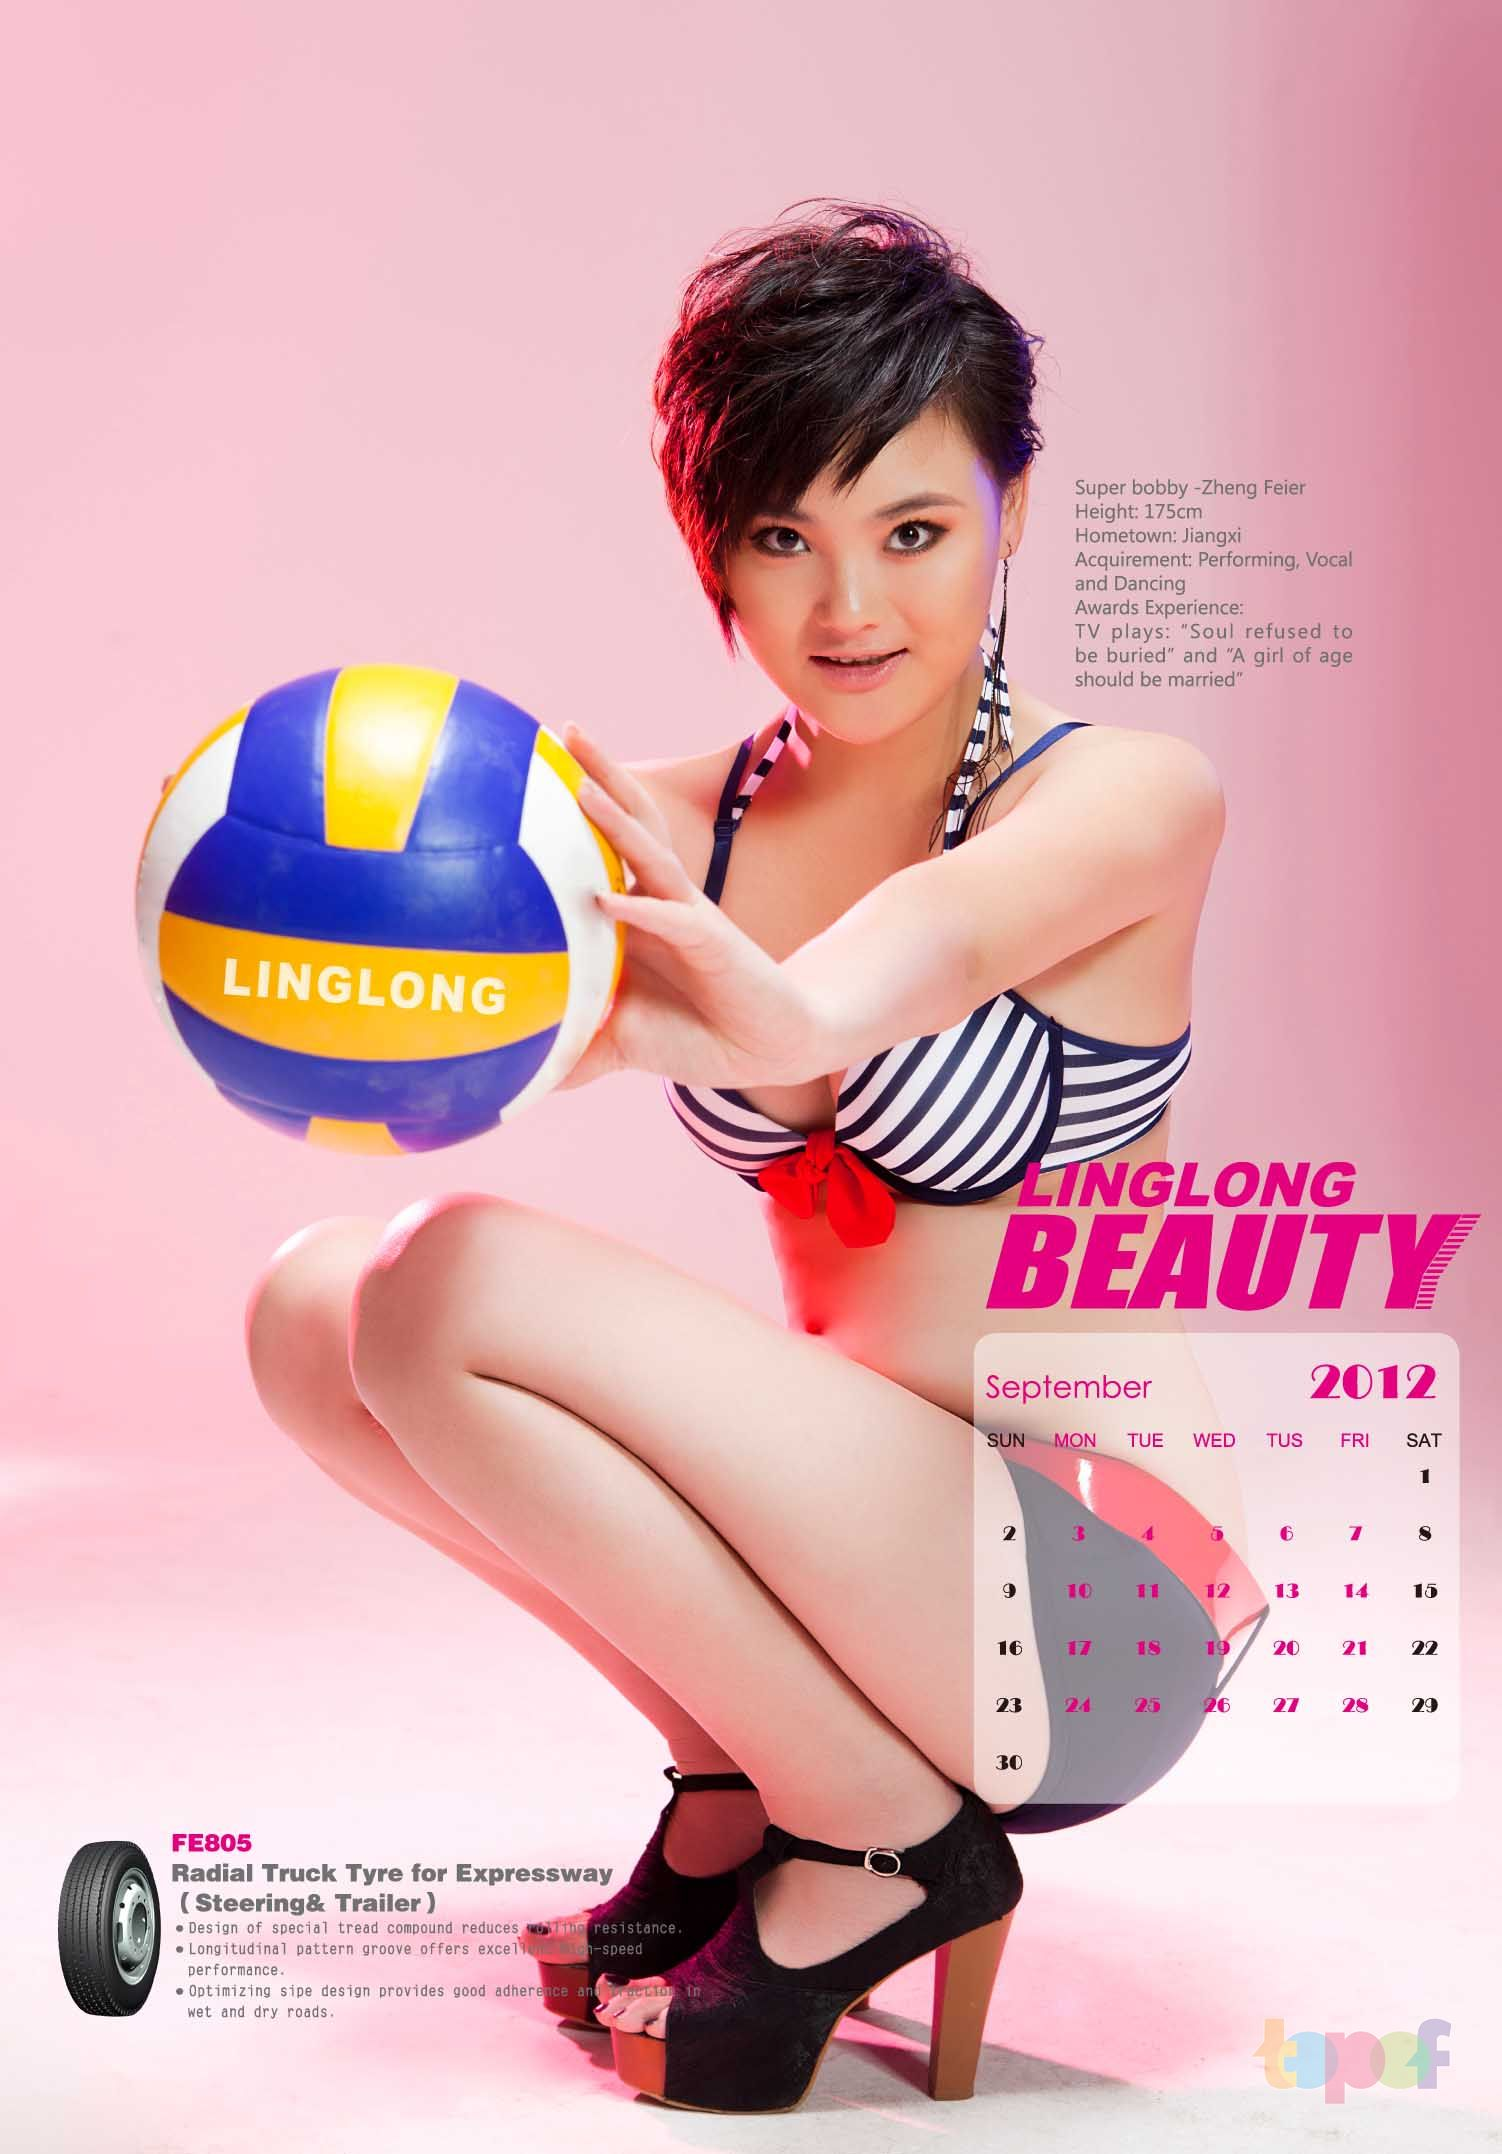 Календари от LingLong (Шины). Сентябрь 2012 года